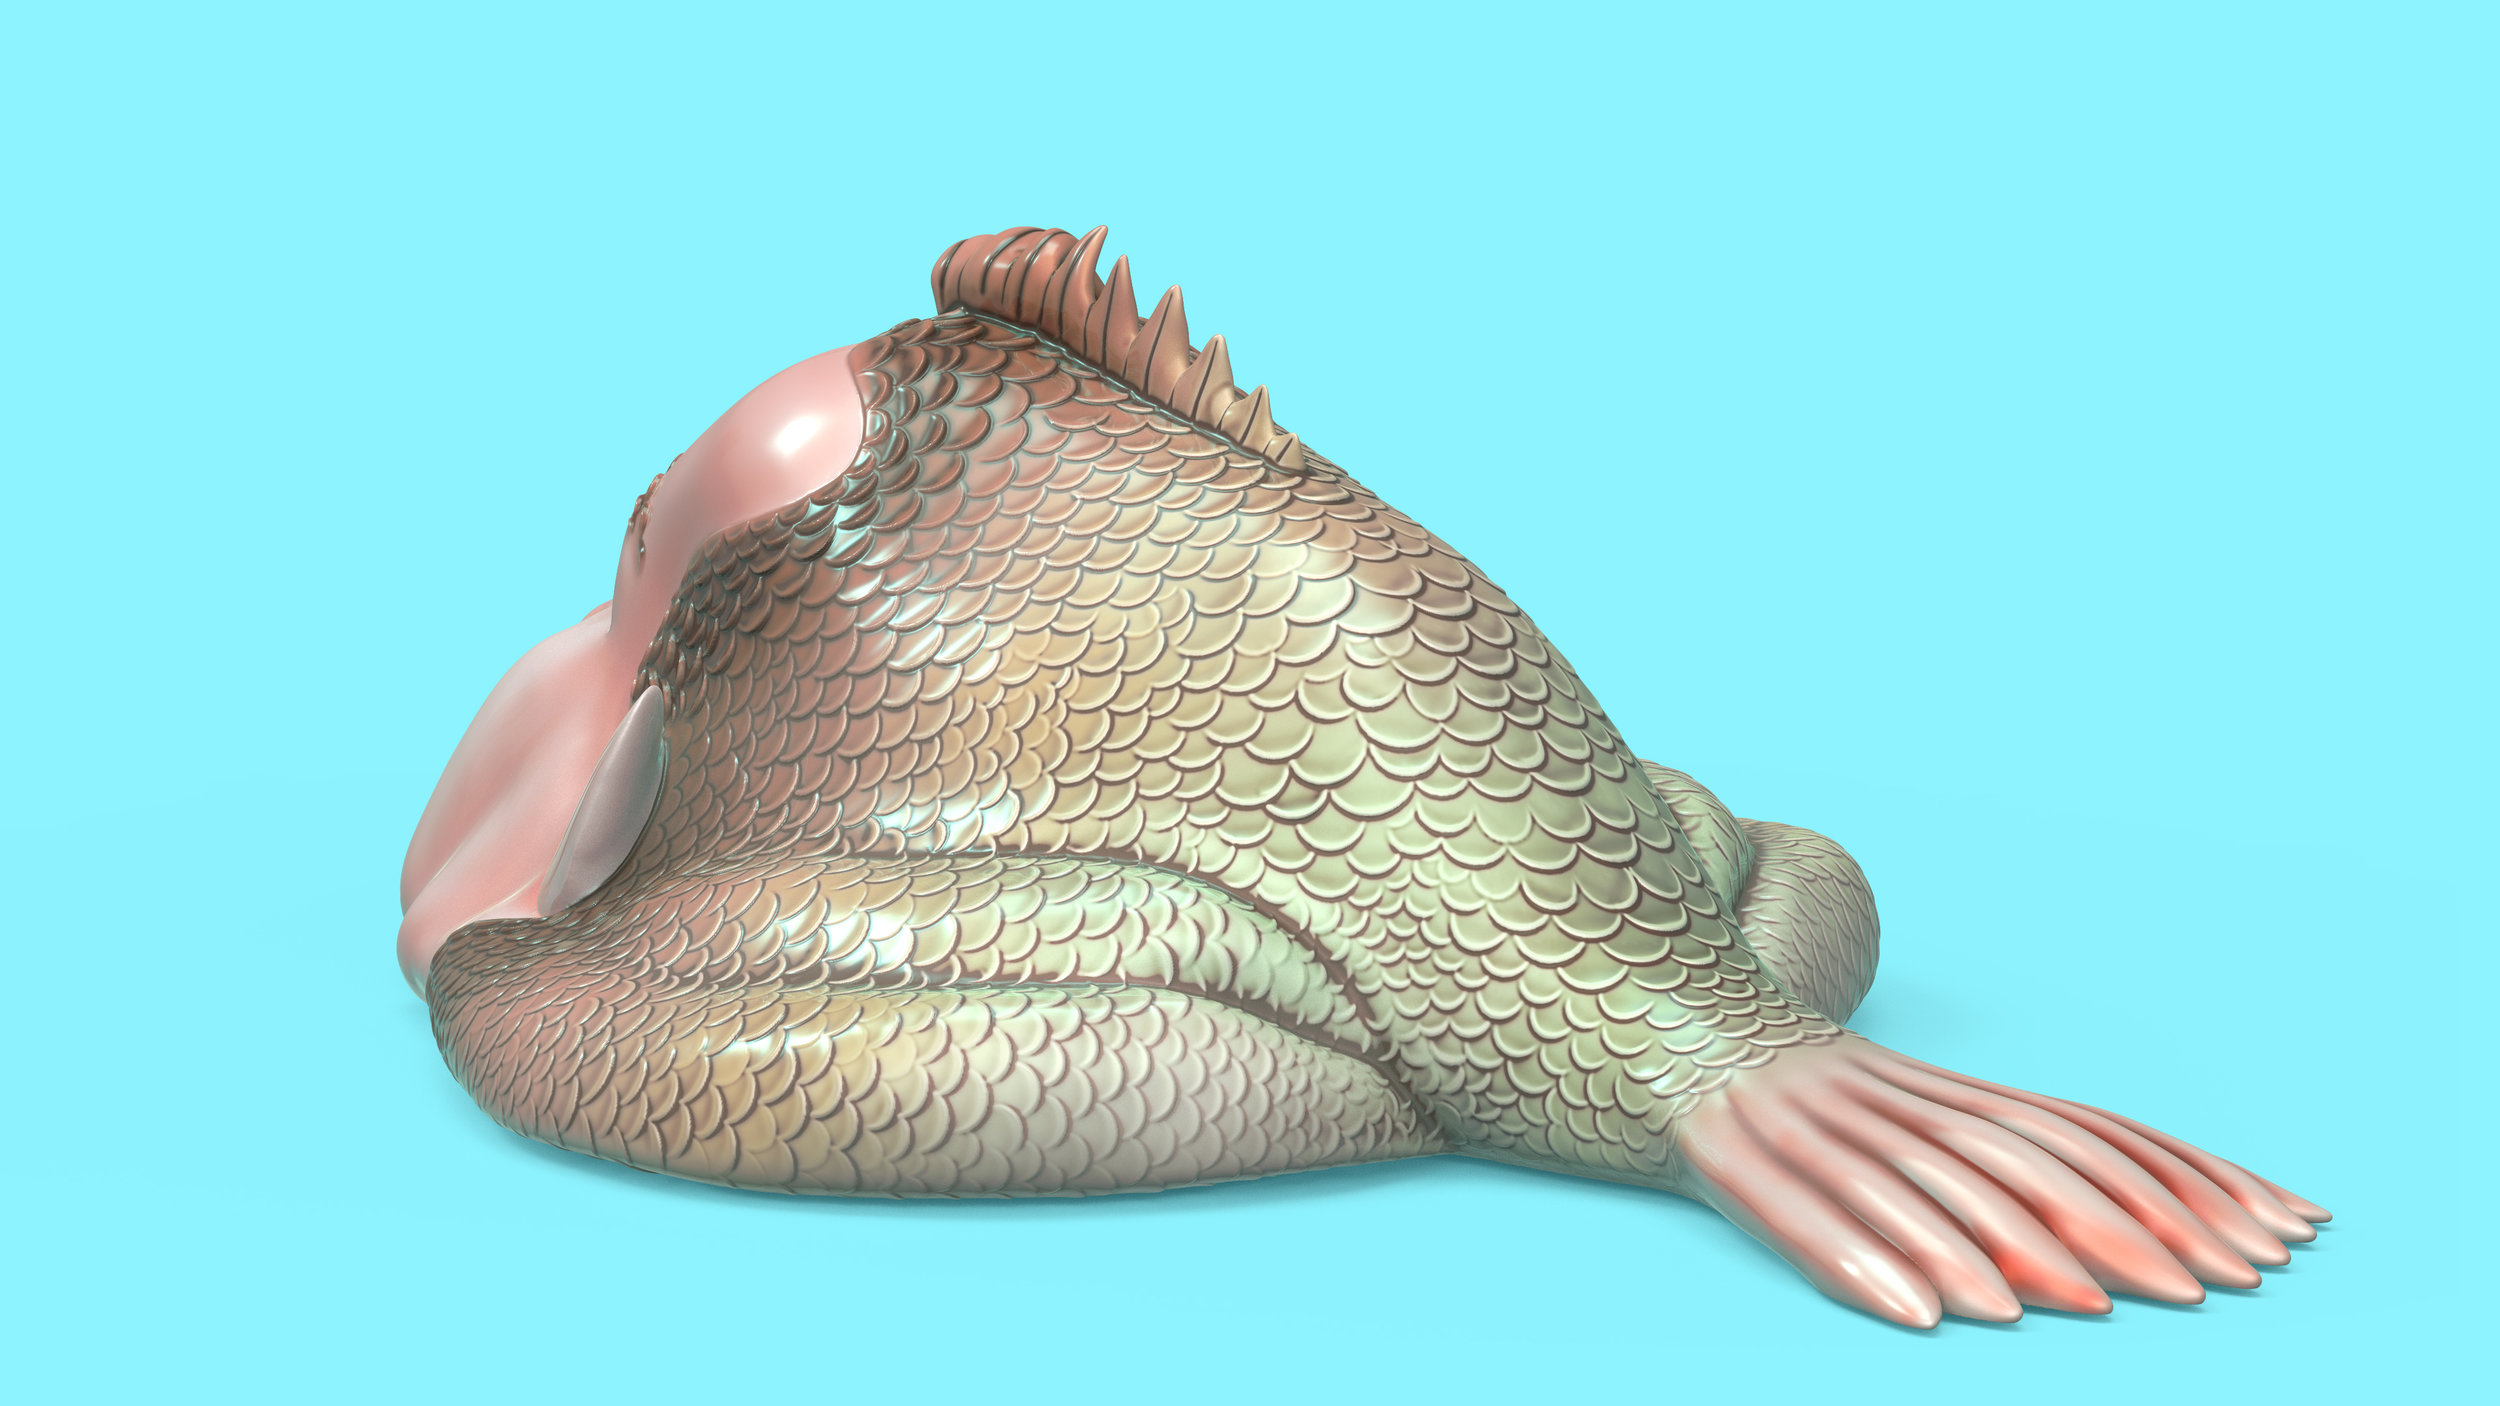 BlobfishRender-Viewset-6.jpg